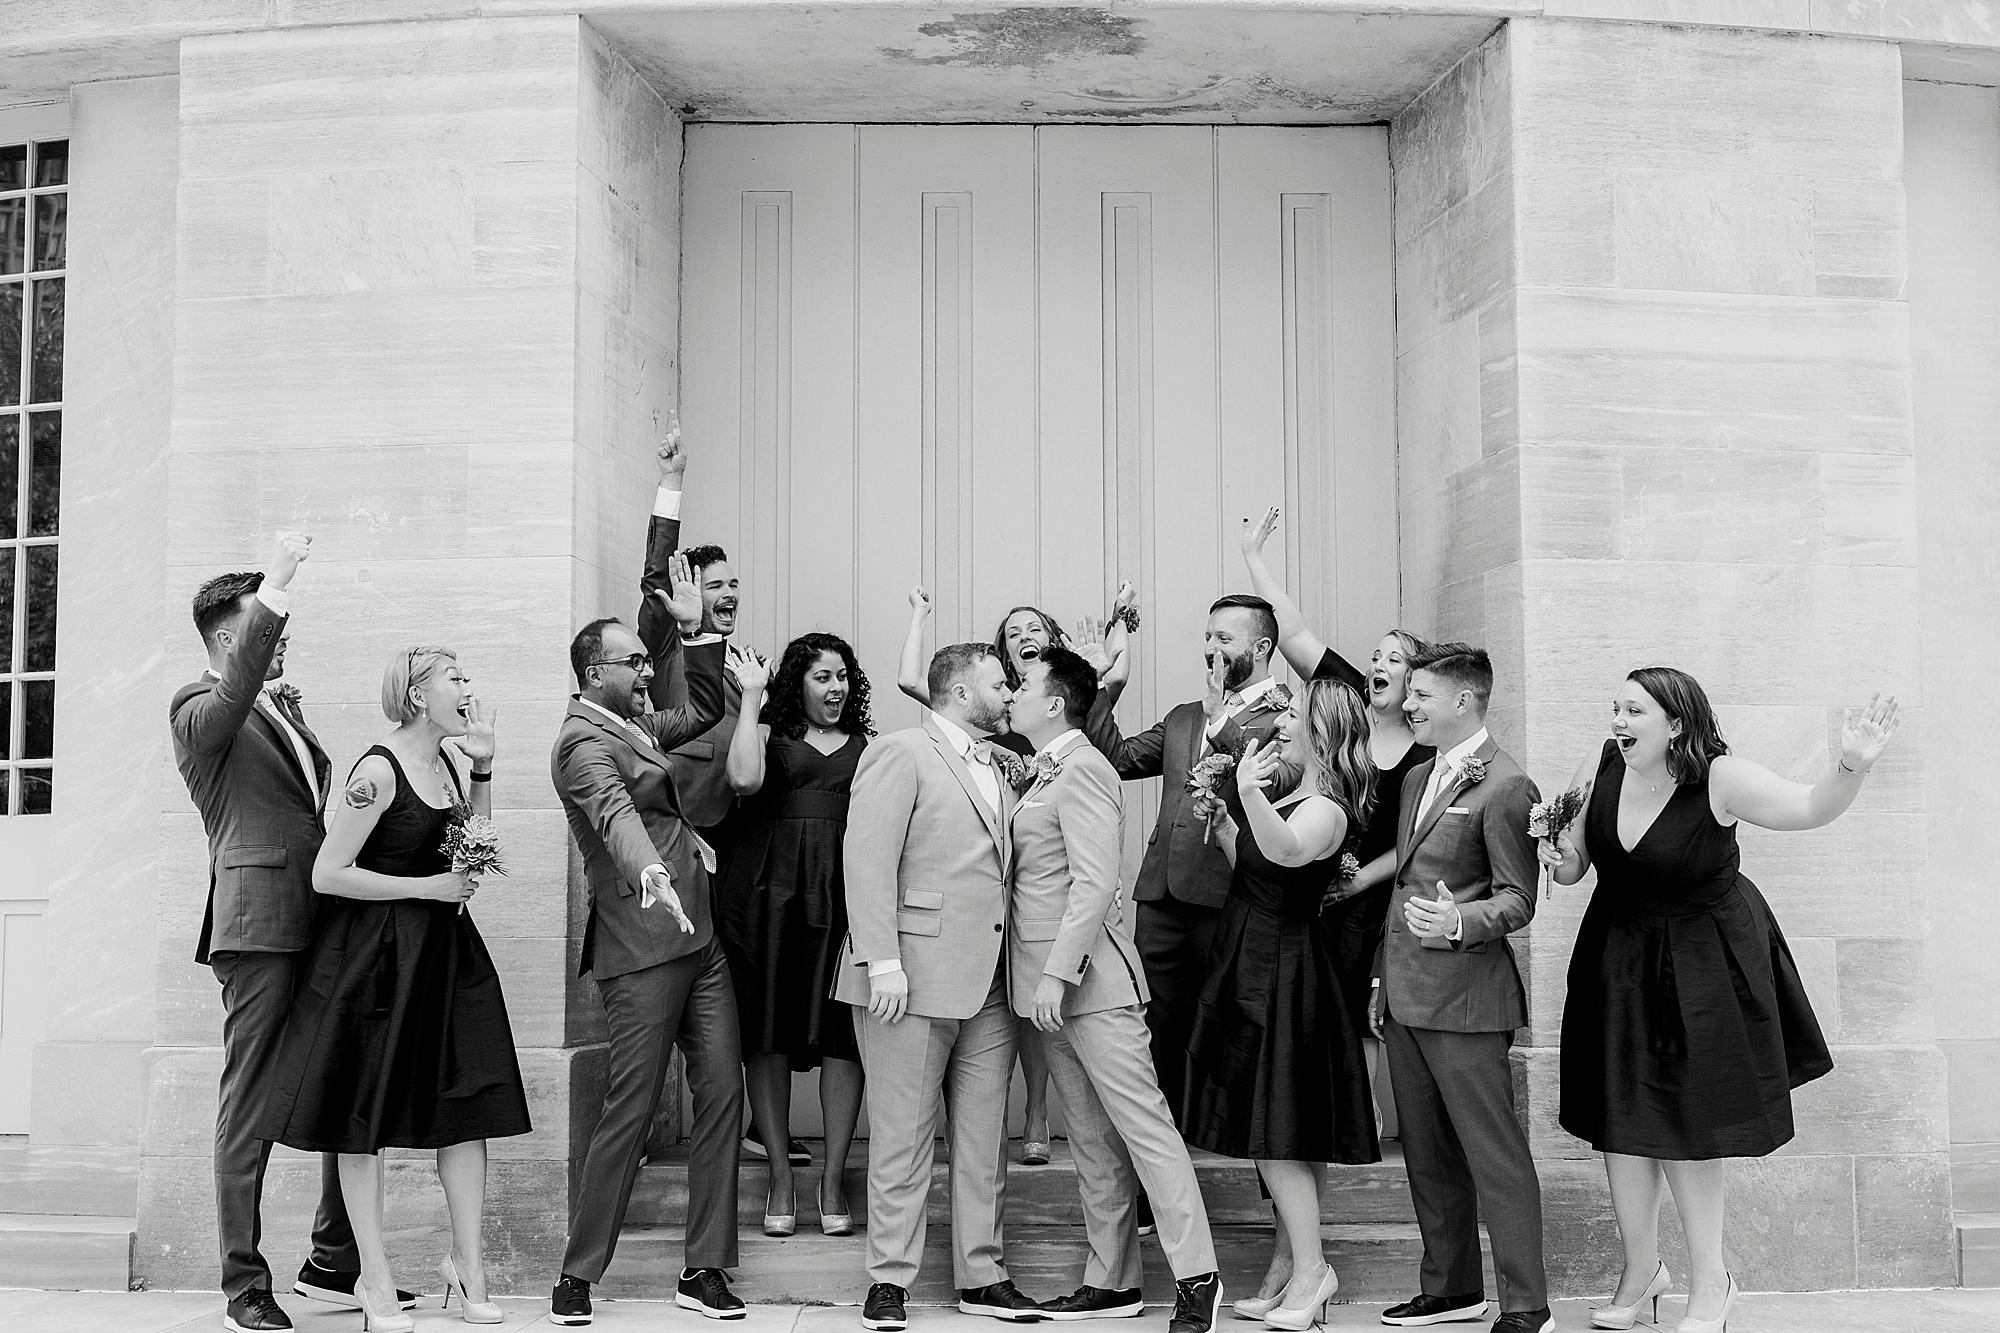 Dan_and_Byron_Love_by_Joe_Mac_Philadelphia_Wedding_LGBTQ_Photography_Gay_Independence_visitor_Center_63.JPG